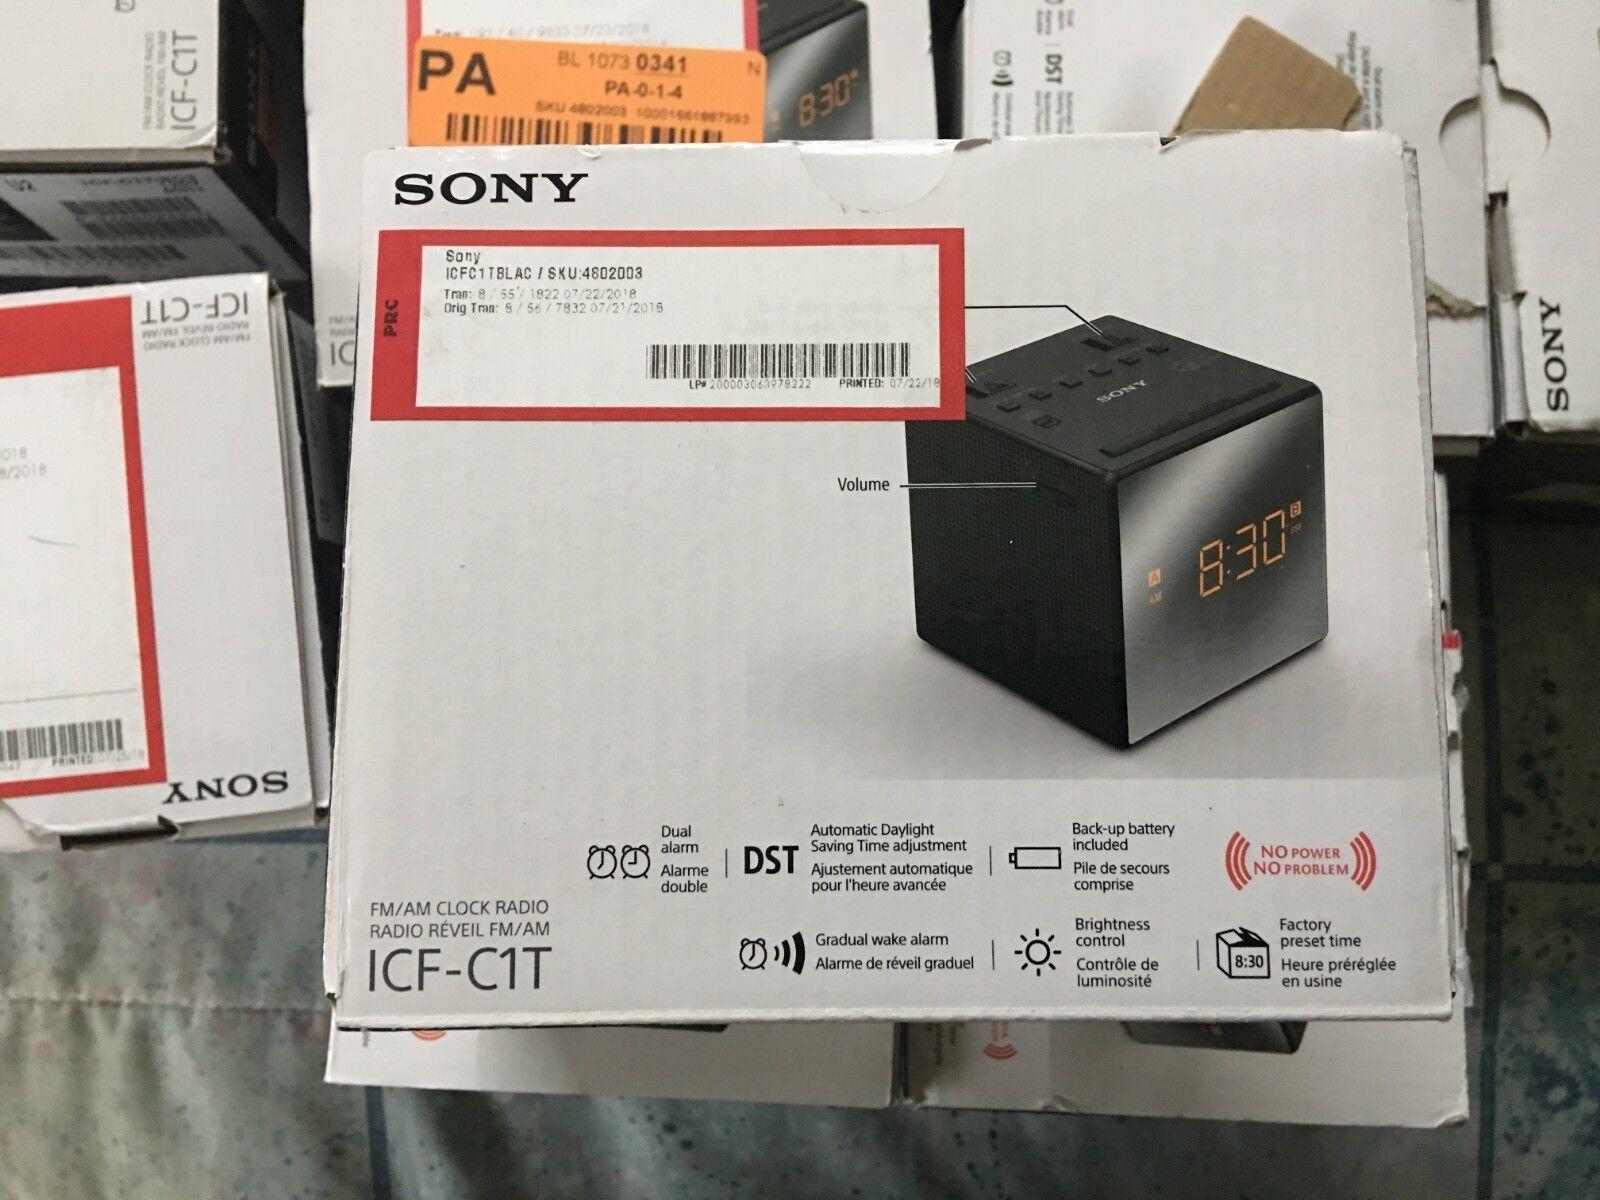 Sony ICF-C1 AM/FM Alarm Clock Radio - Black (USED)